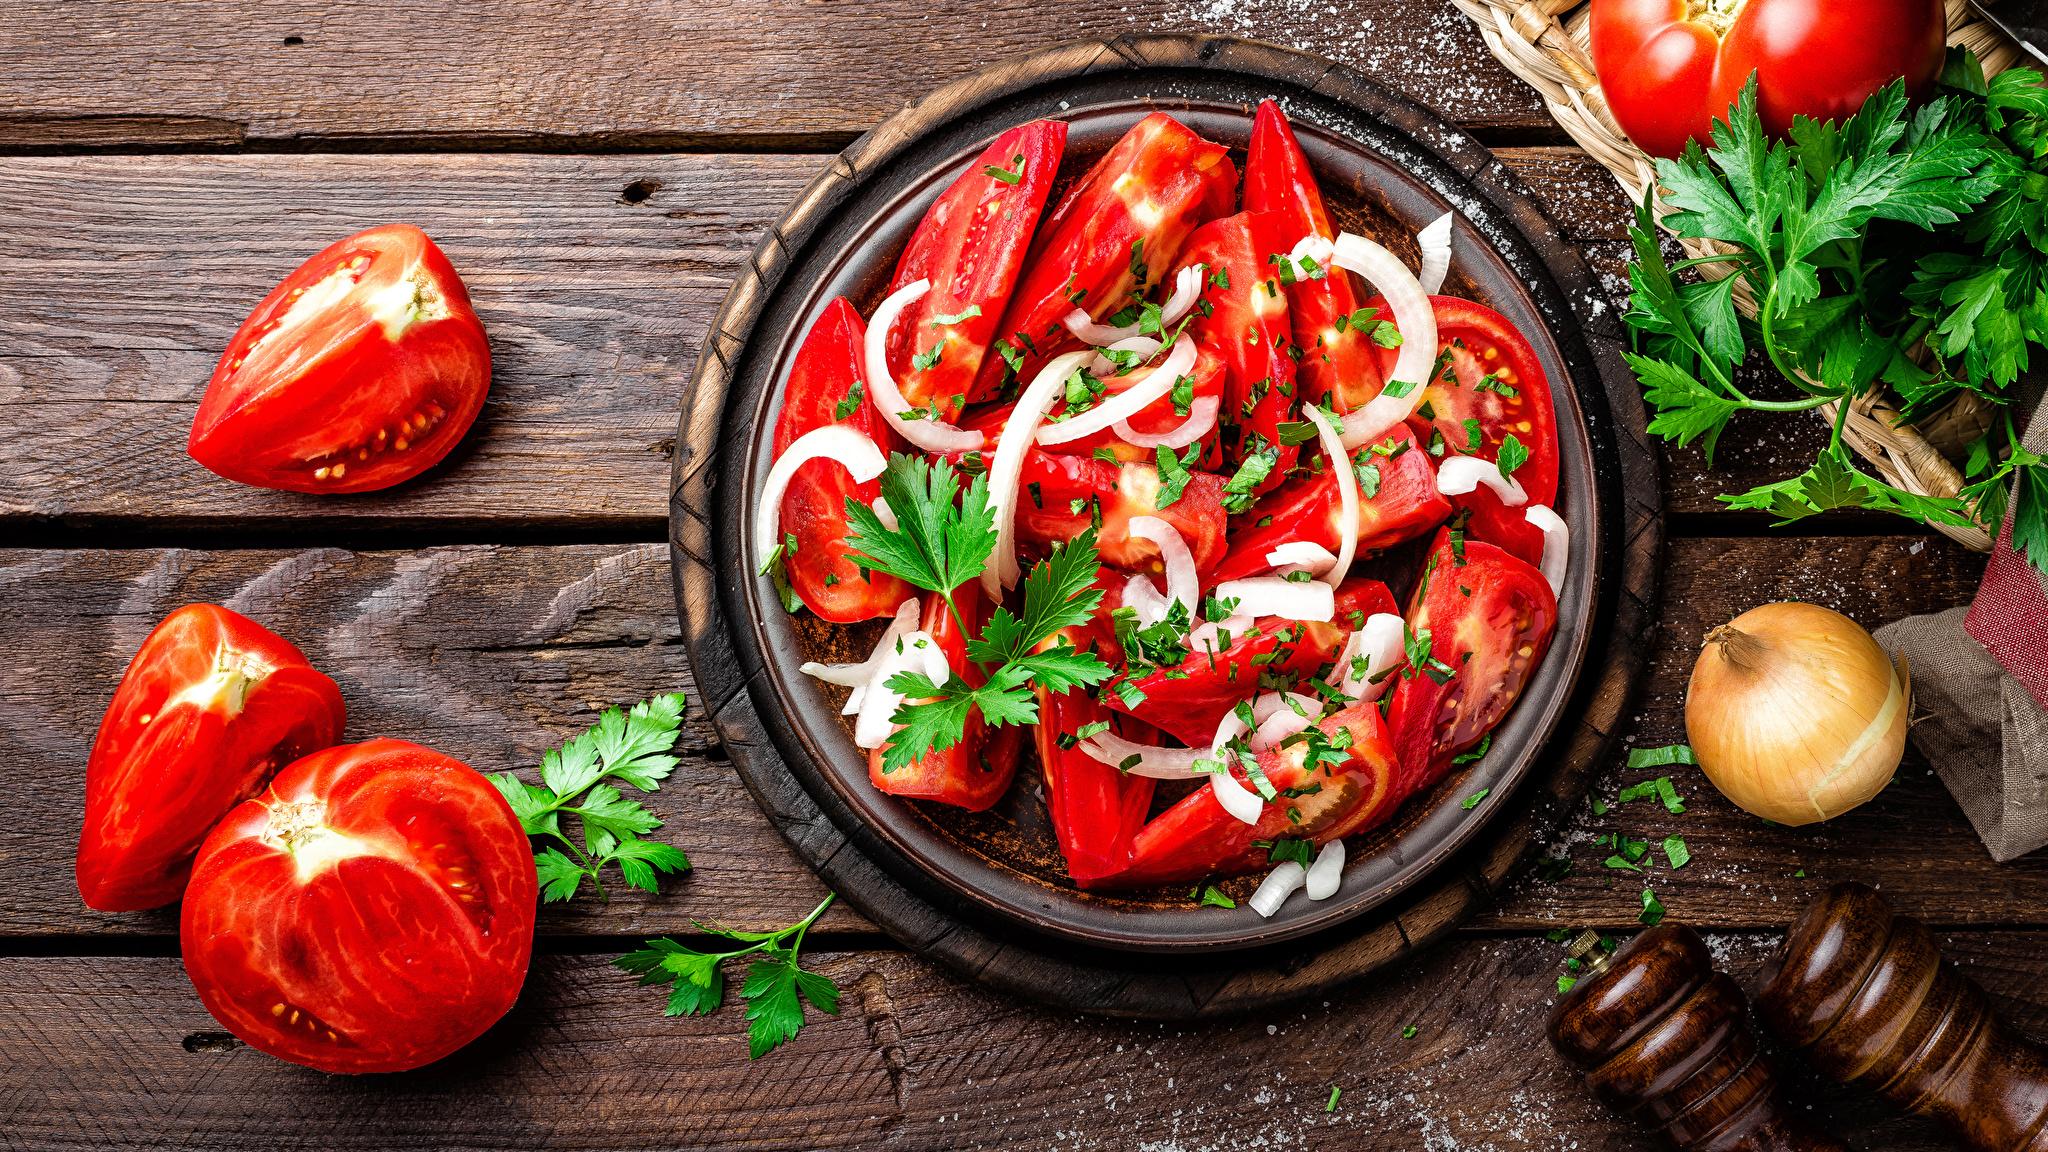 Fotos von Tomate Salat Gemüse Lebensmittel Bretter 2048x1152